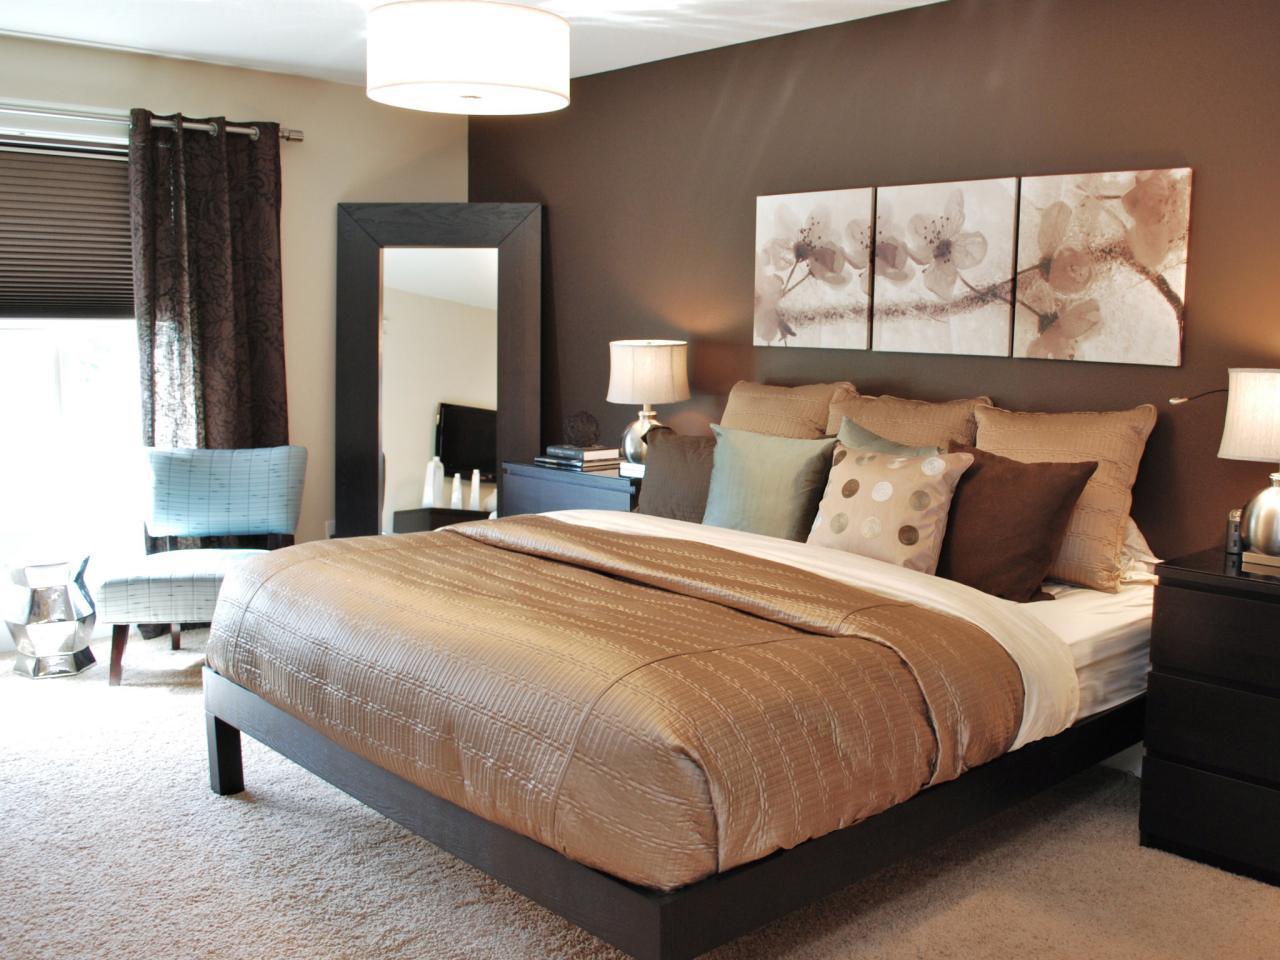 Images of Boyu0027s Blue Bedroom master bedroom color ideas